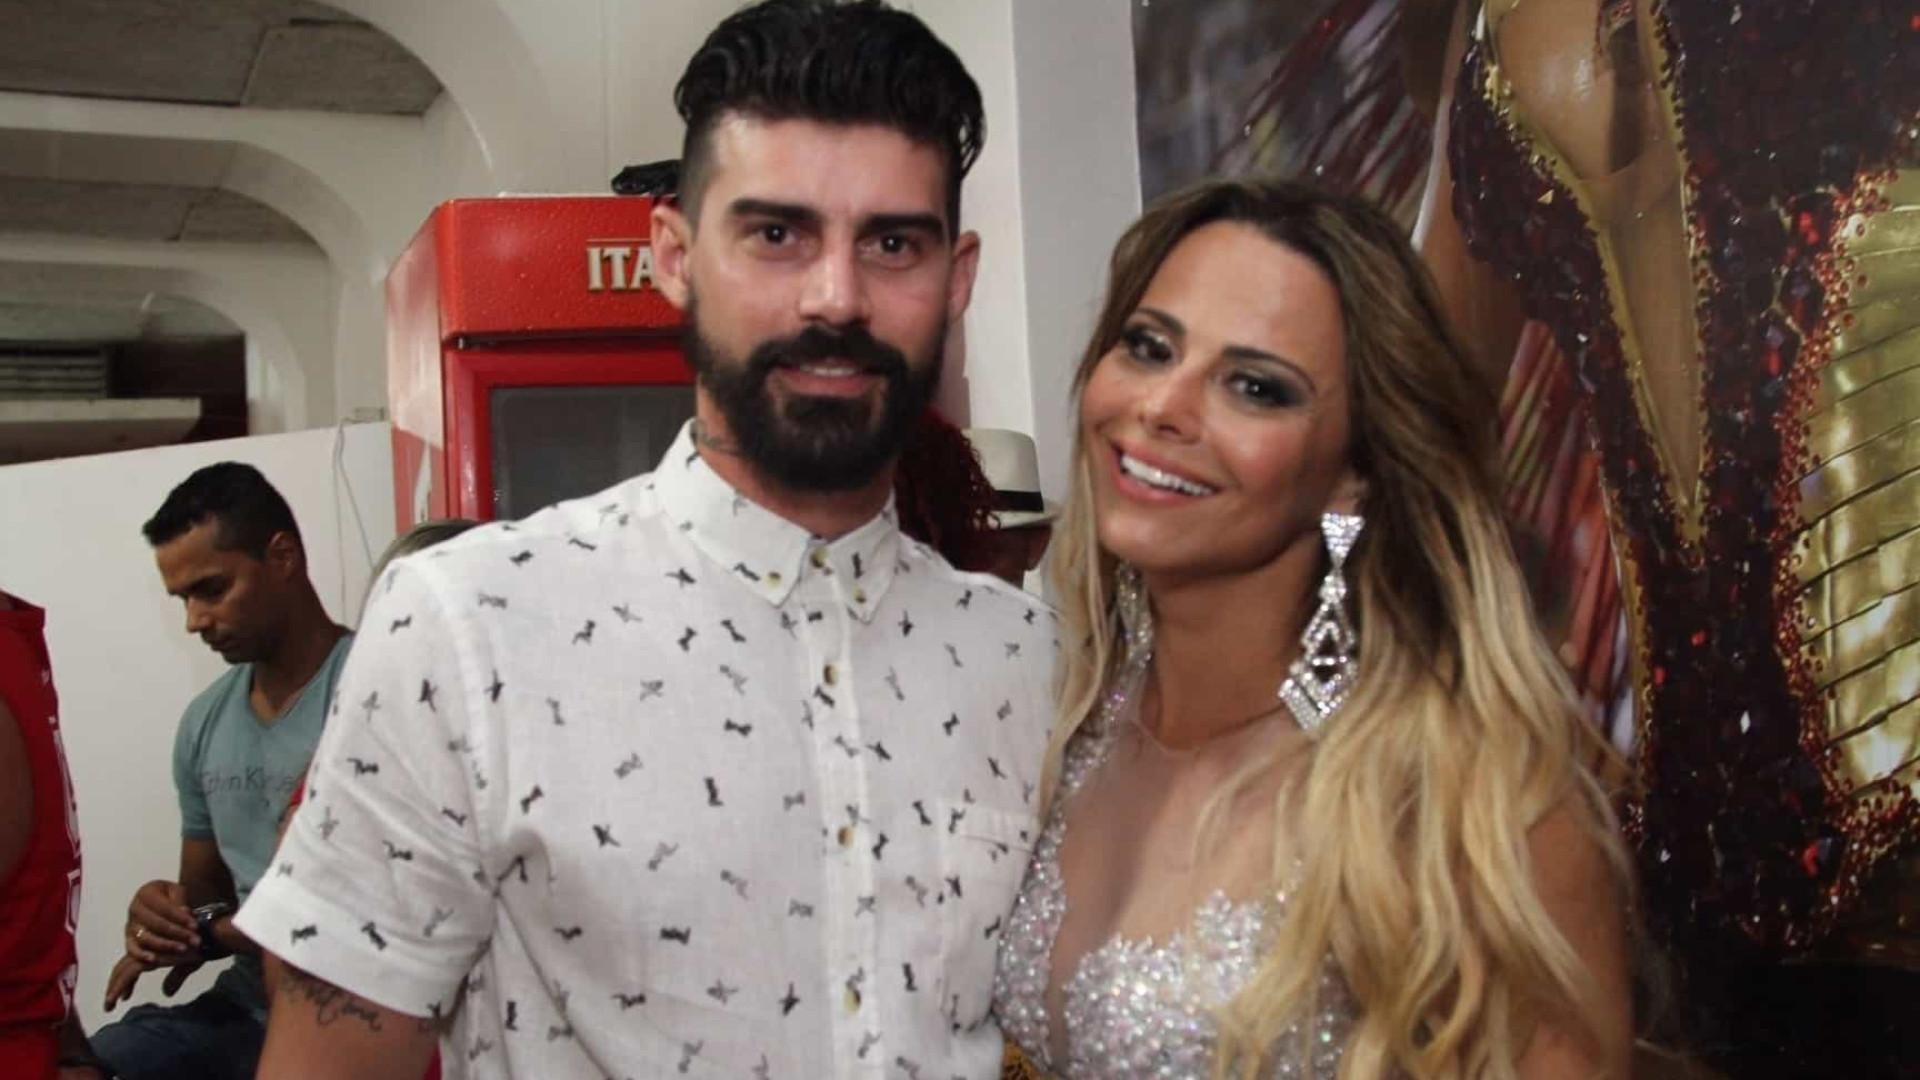 Viviane Araújo registra B.O. e vai processar esposa de Radamés